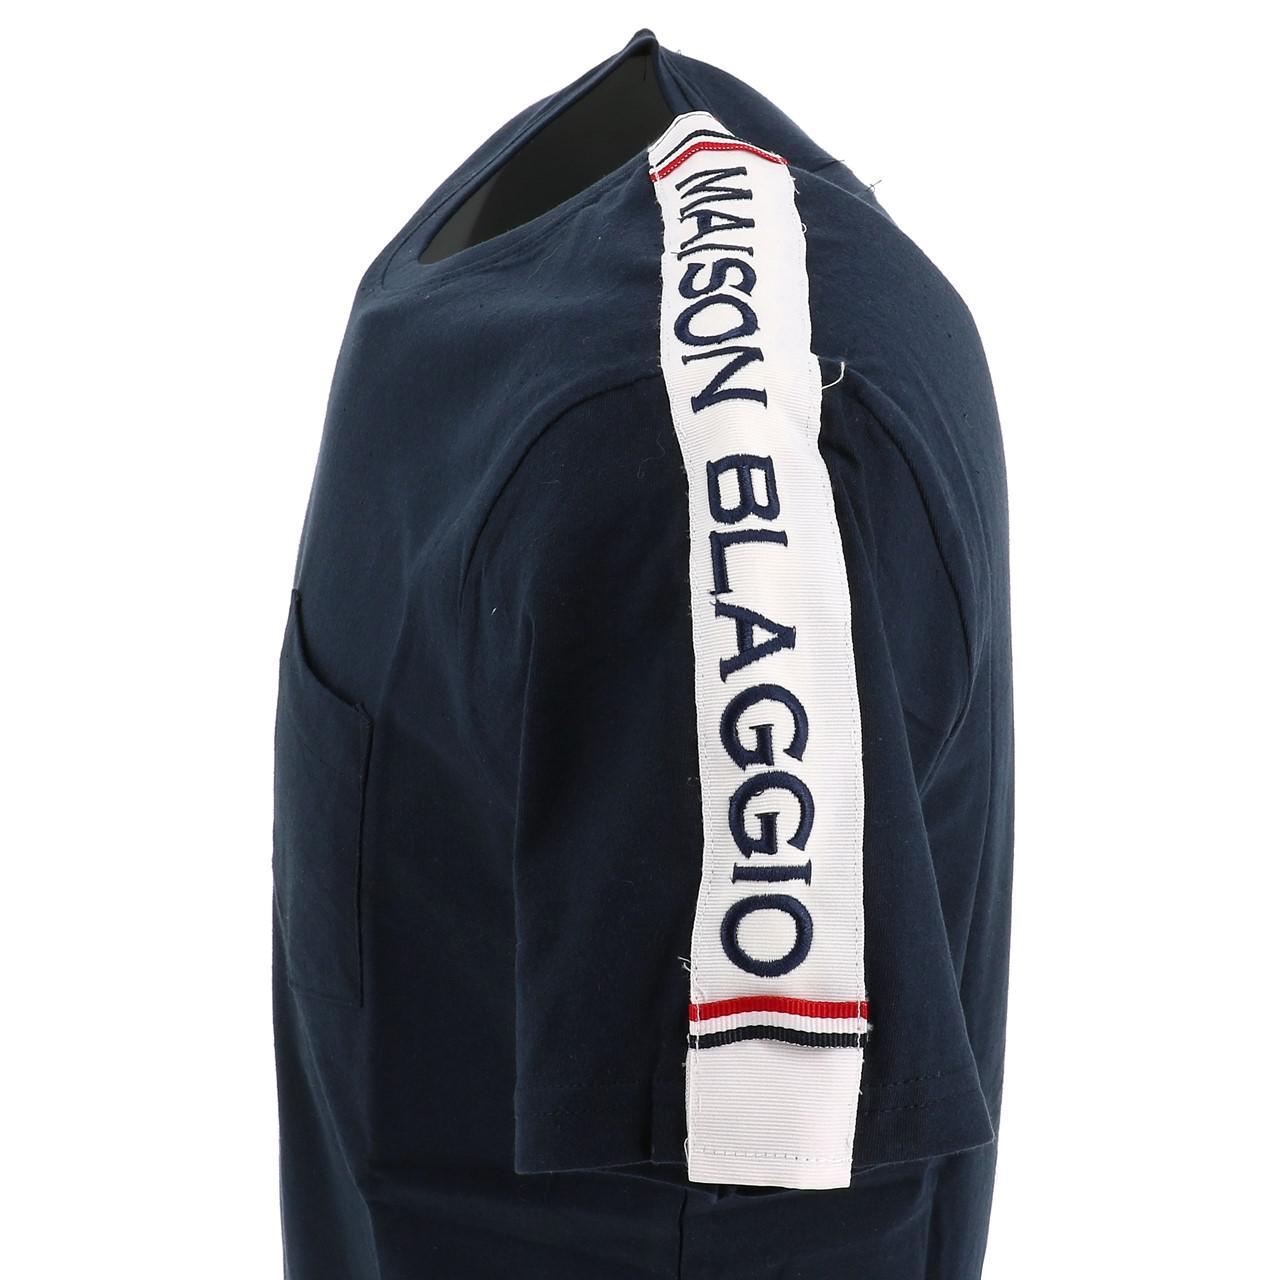 Short-Sleeve-T-Shirt-La-Maison-Blaggio-Metili-Navy-Mc-Tee-Blue-27343-New thumbnail 3